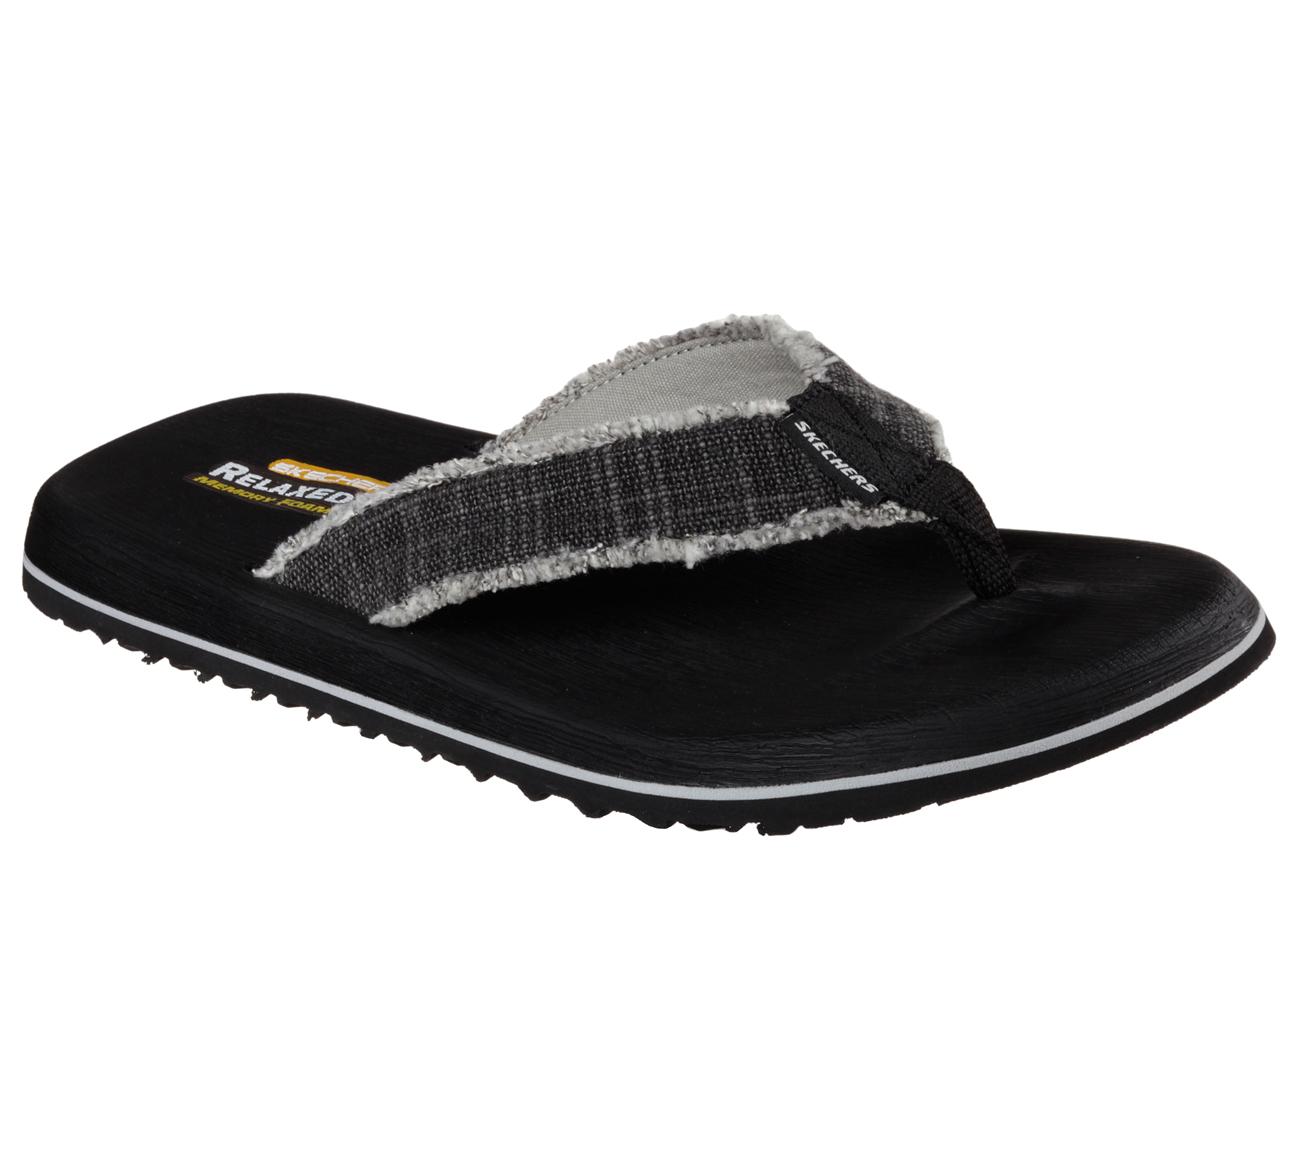 32bab66e73c Men S Skechers Relaxed Fit Memory Foam 360 Sandals.Mens Skechers ...